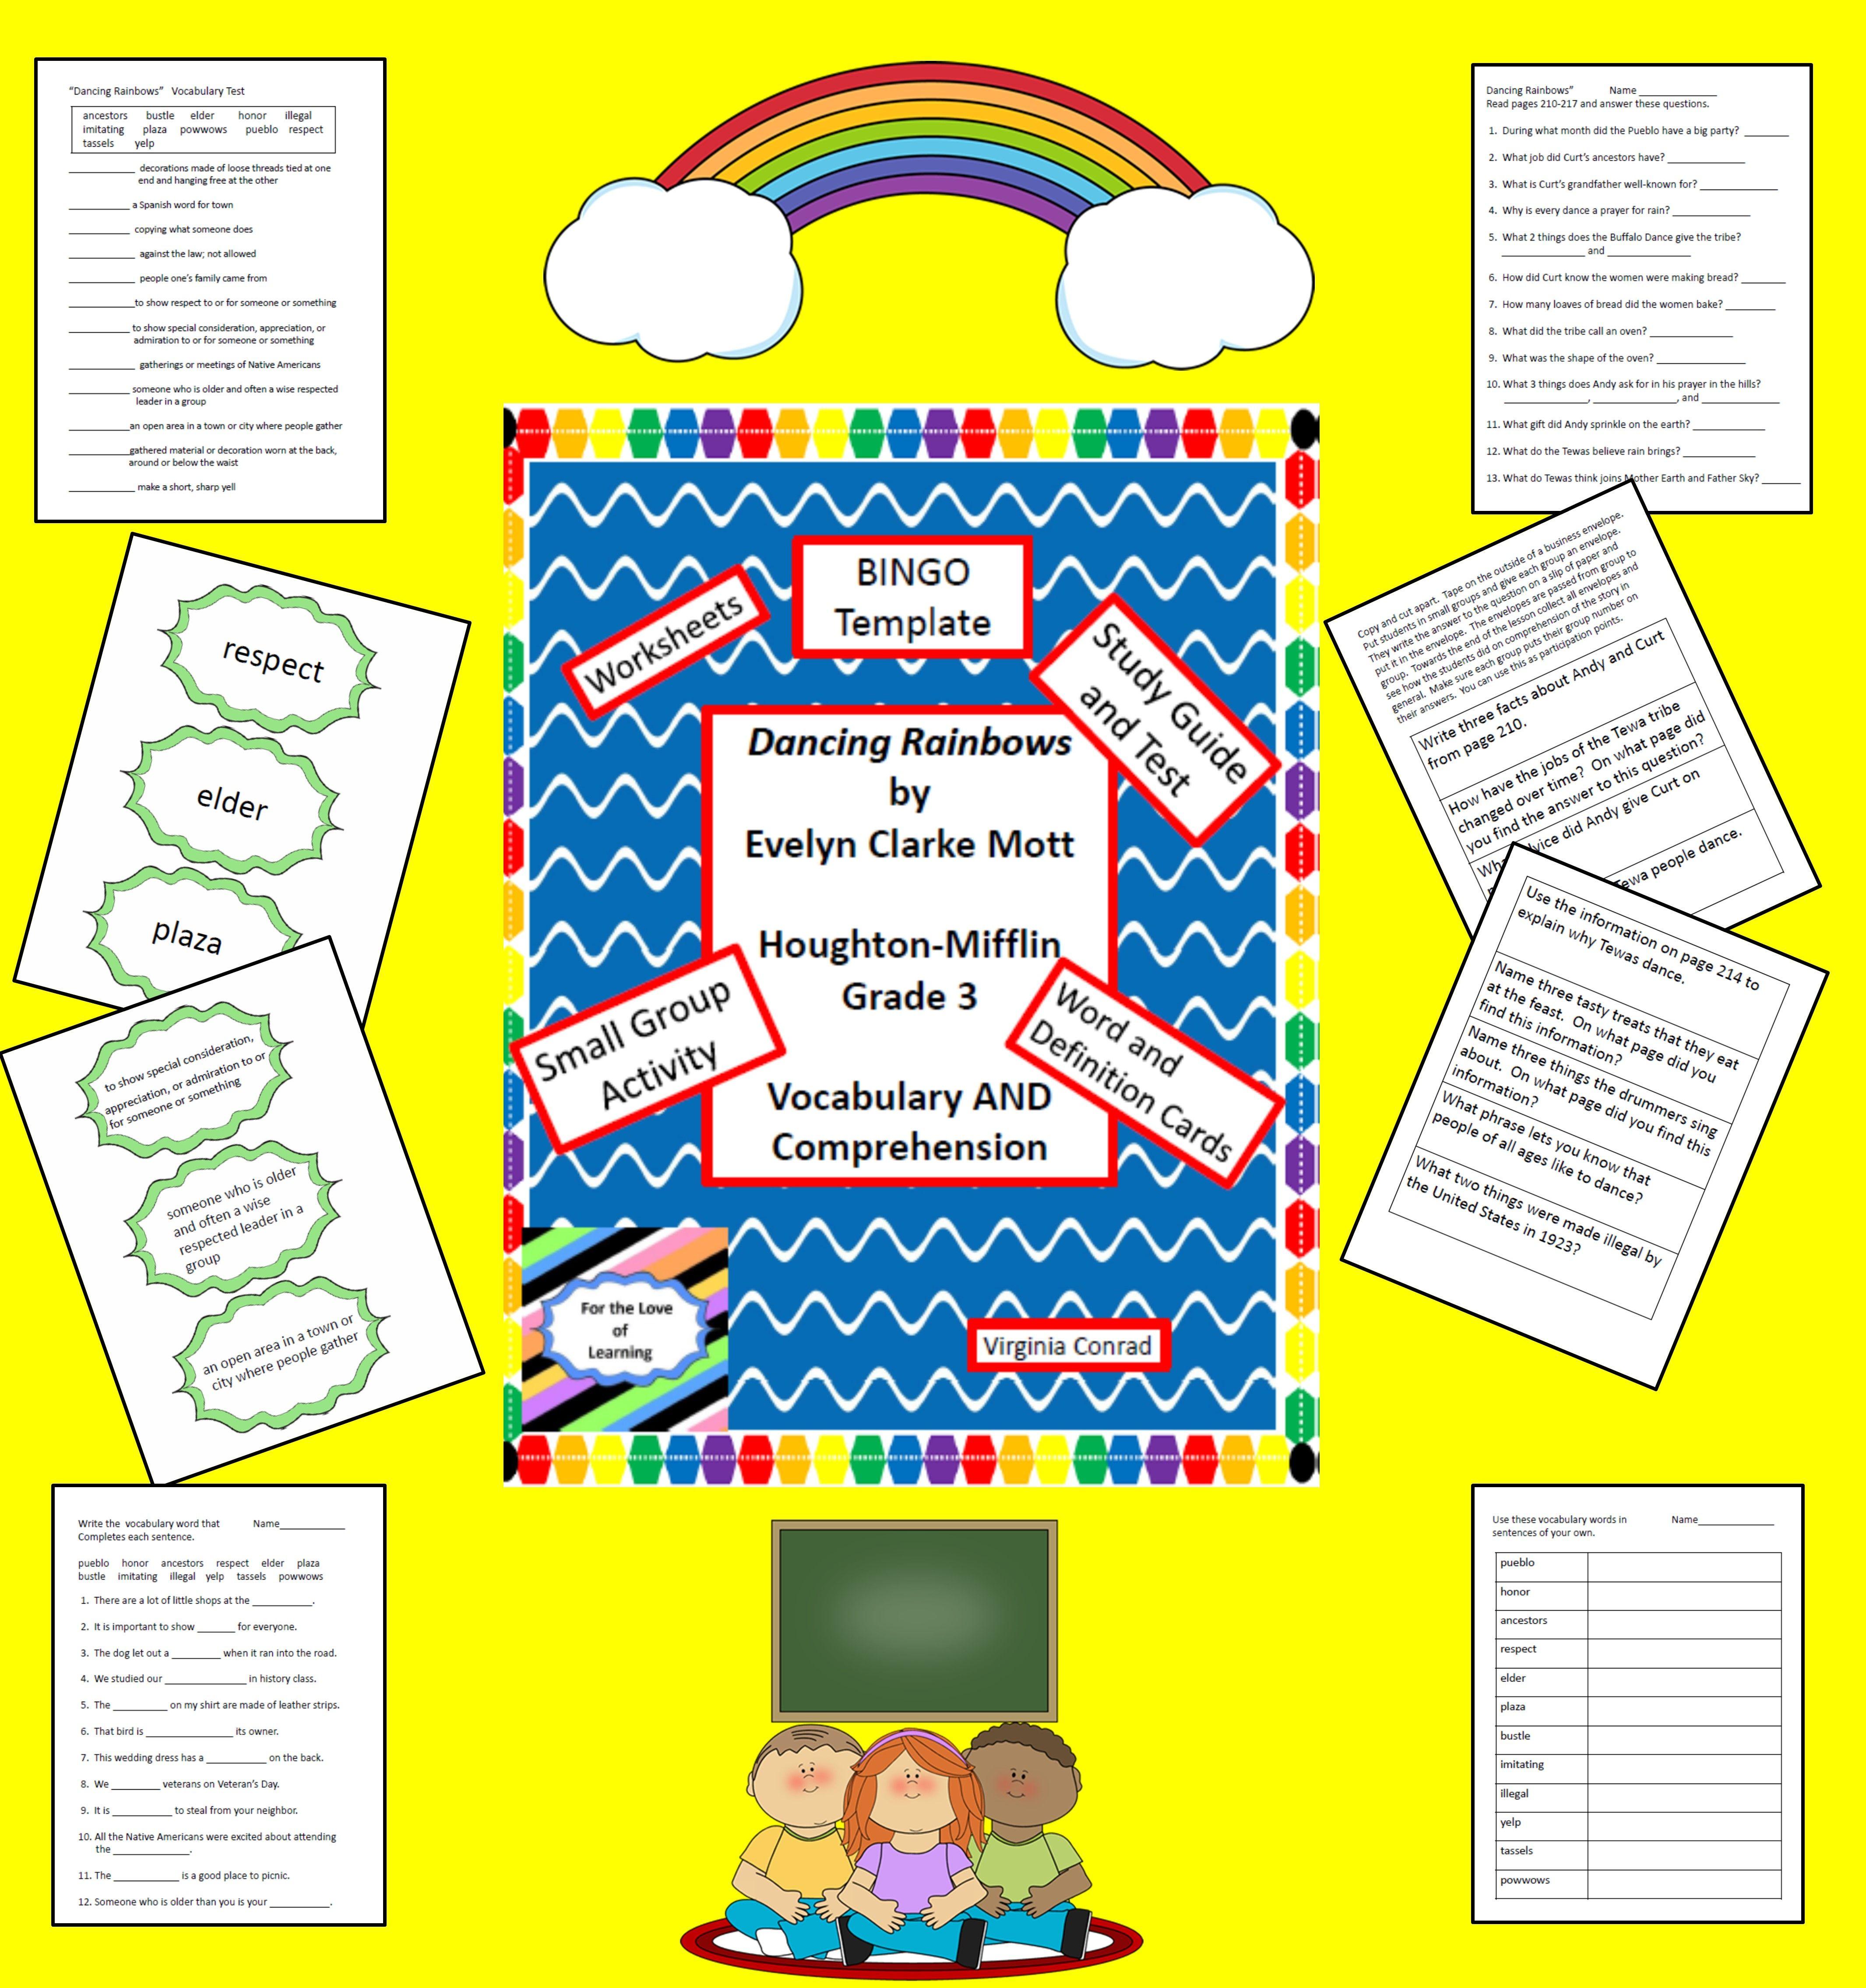 Supplemental Vocab And Comprehension Materials For Dancing Rainbows Grade 3 Houghton Mifflin Vocab Mifflin Study Guide Template [ 4541 x 4262 Pixel ]